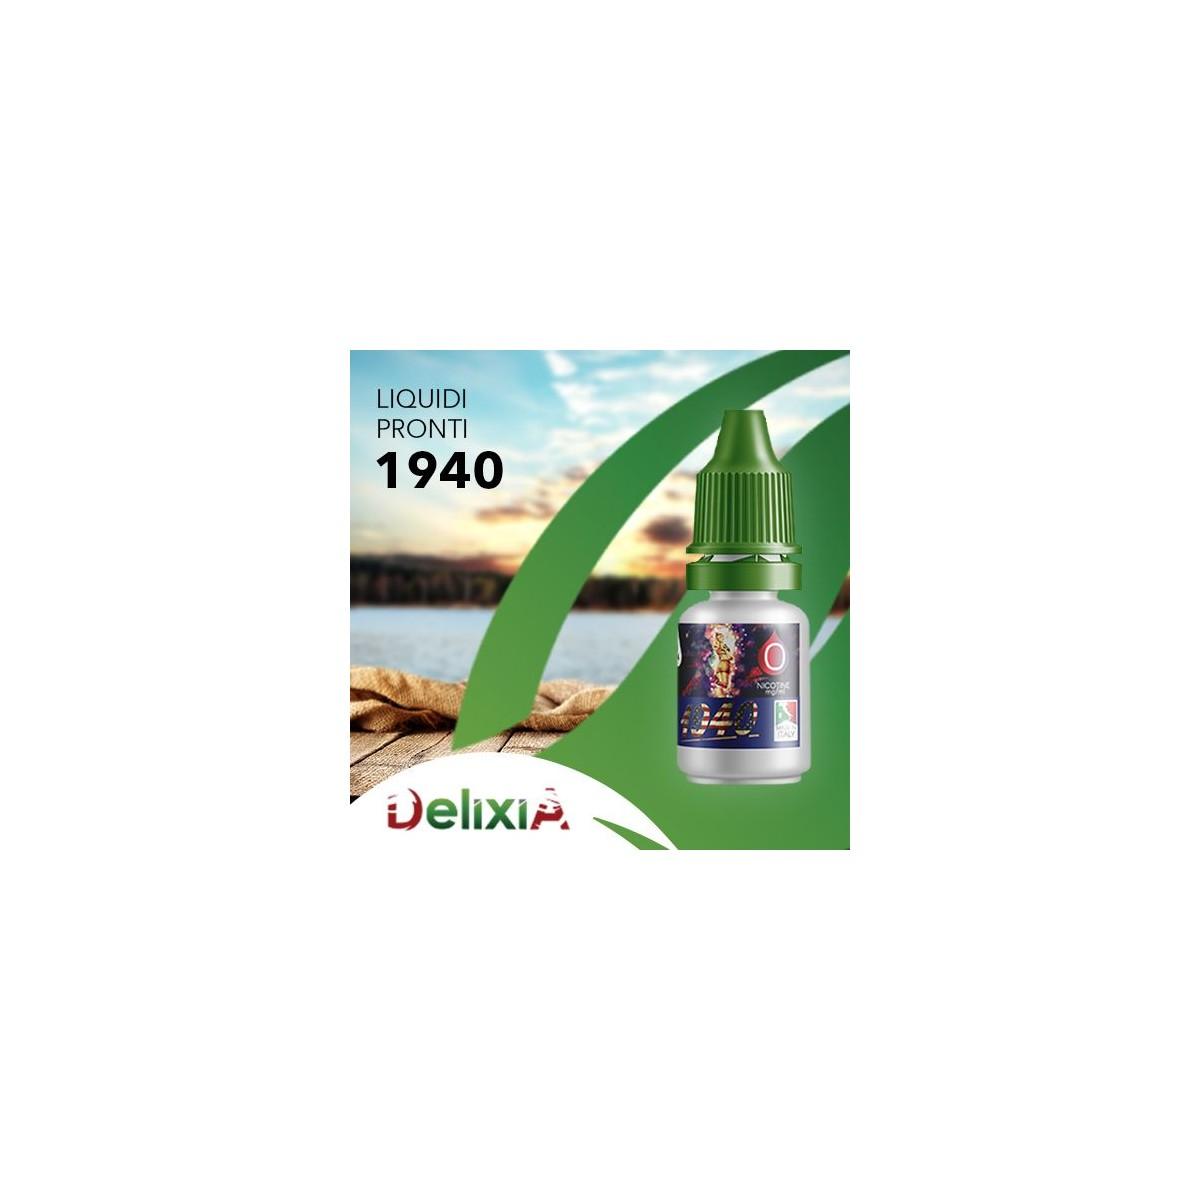 Delixia 10ml - 1940-0mg/ml